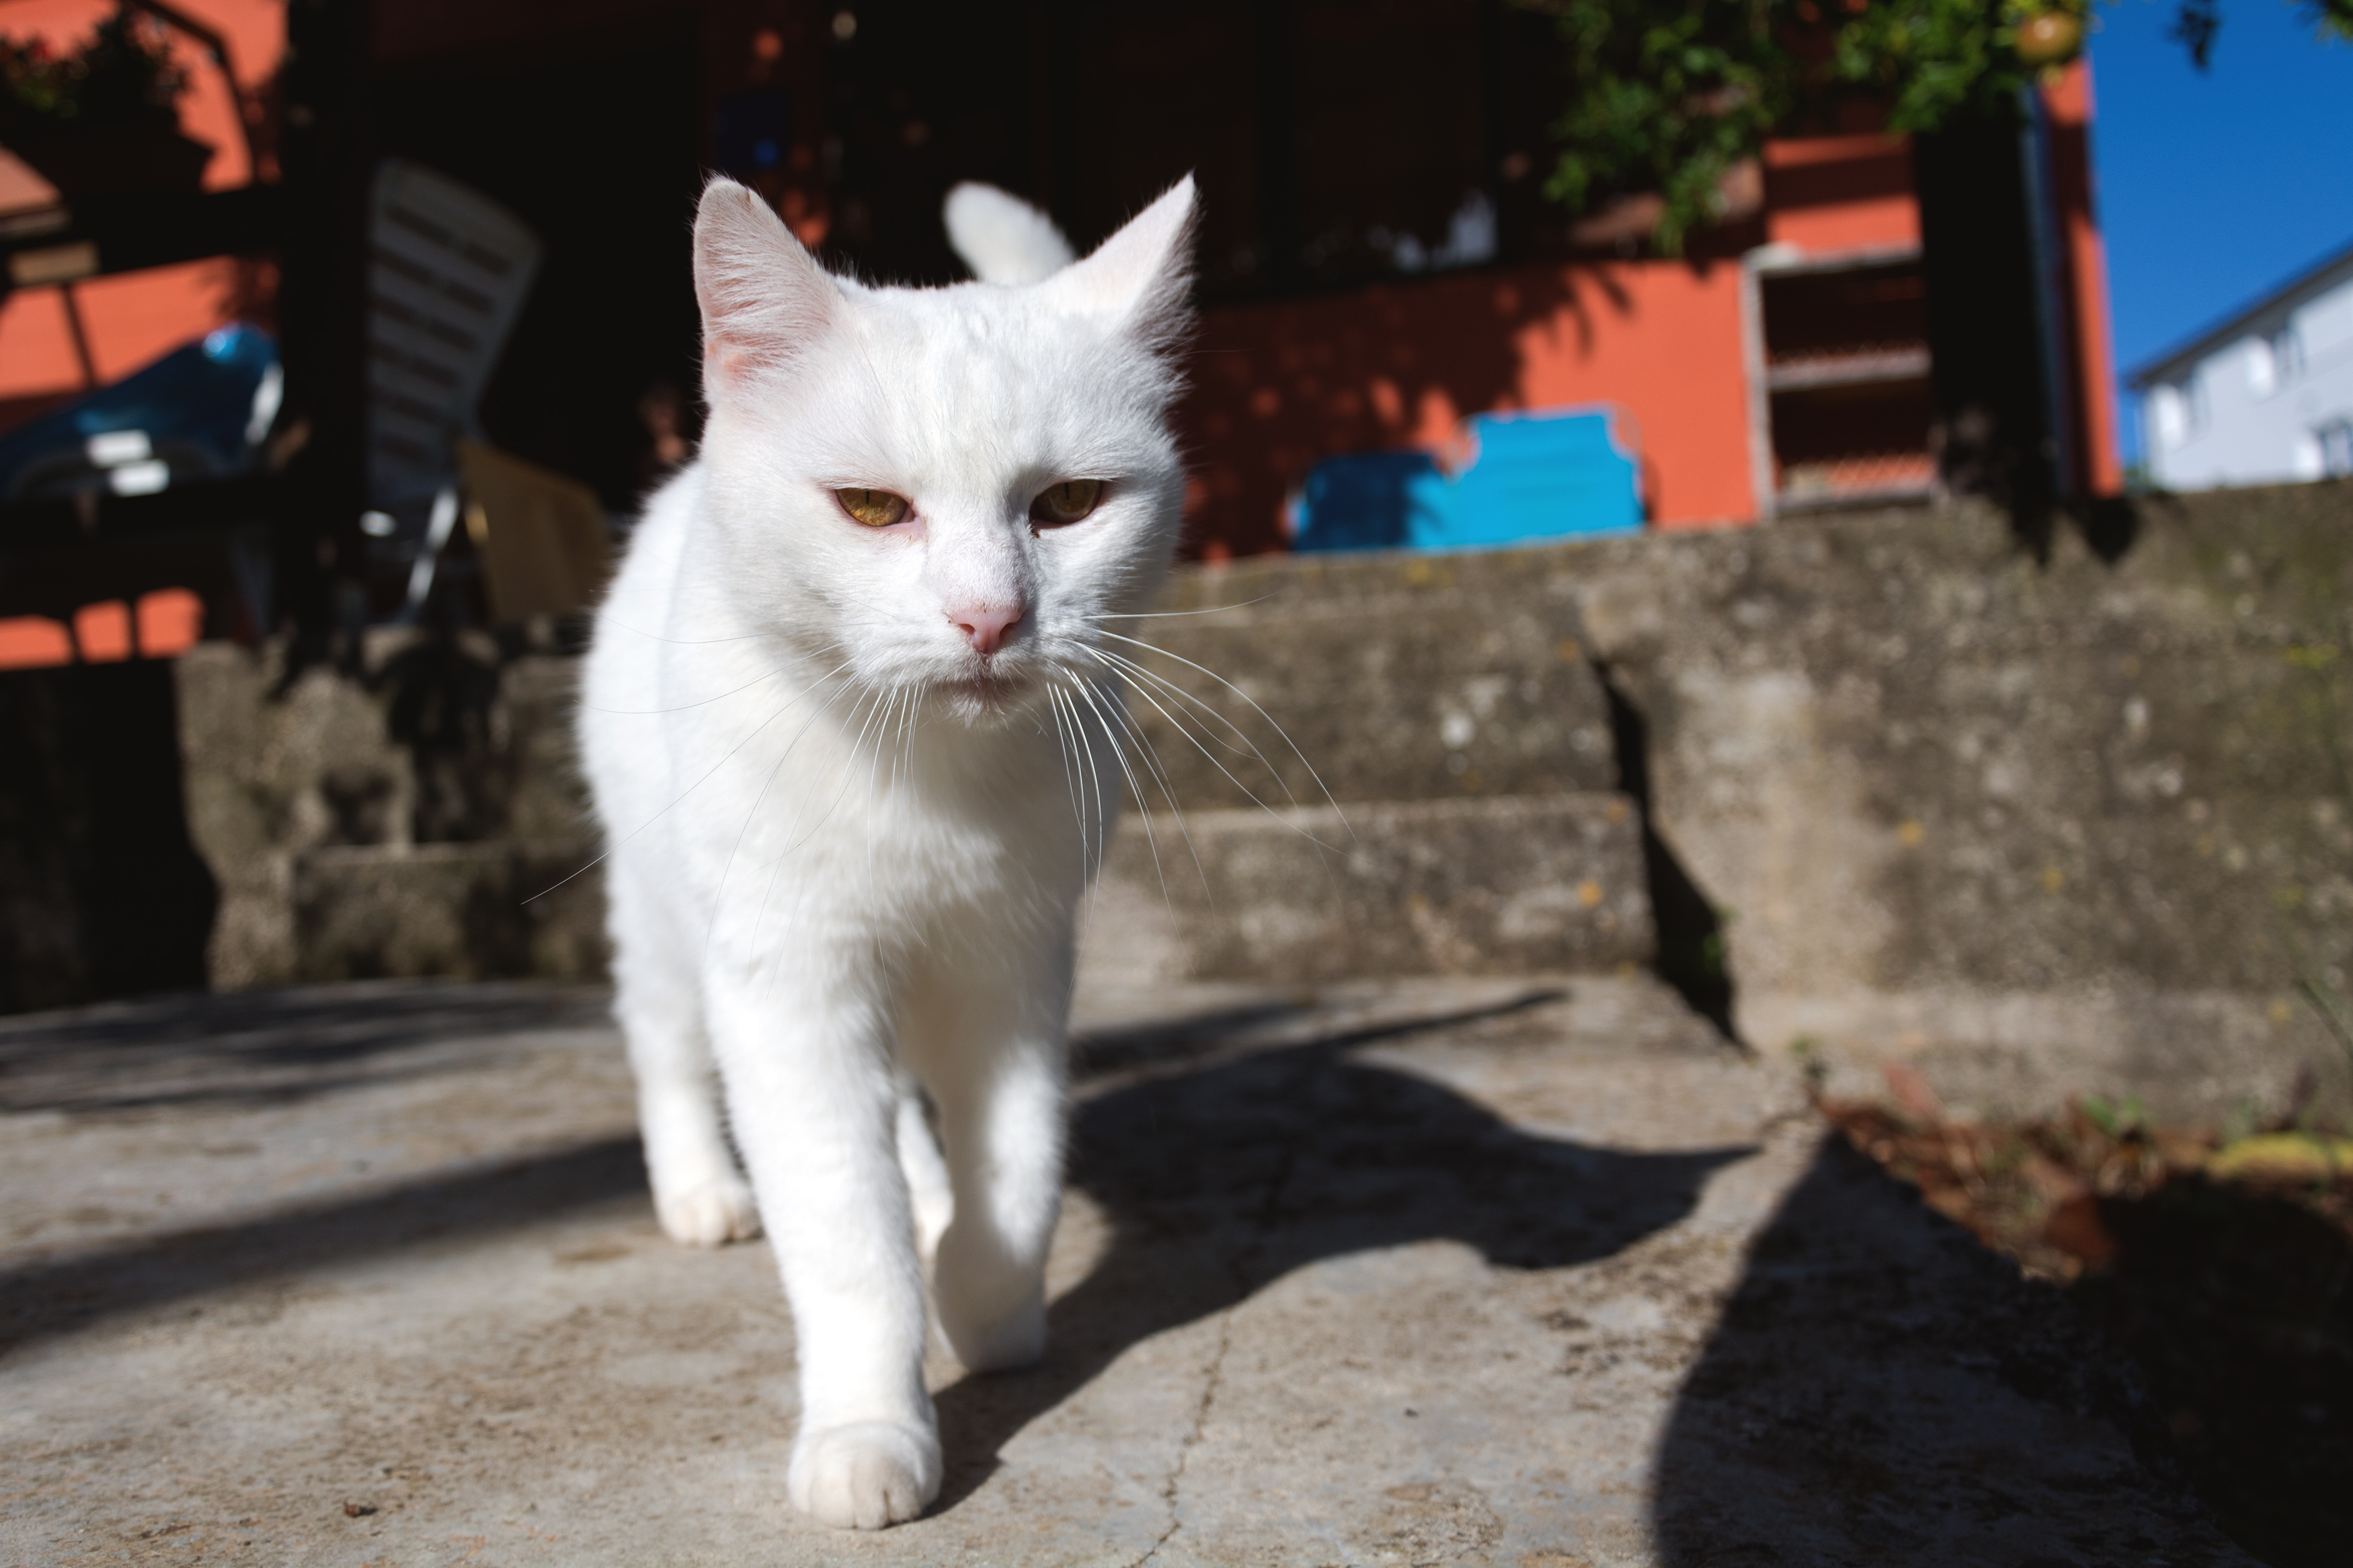 Free Image: White Cat | Libreshot Public Domain Photos